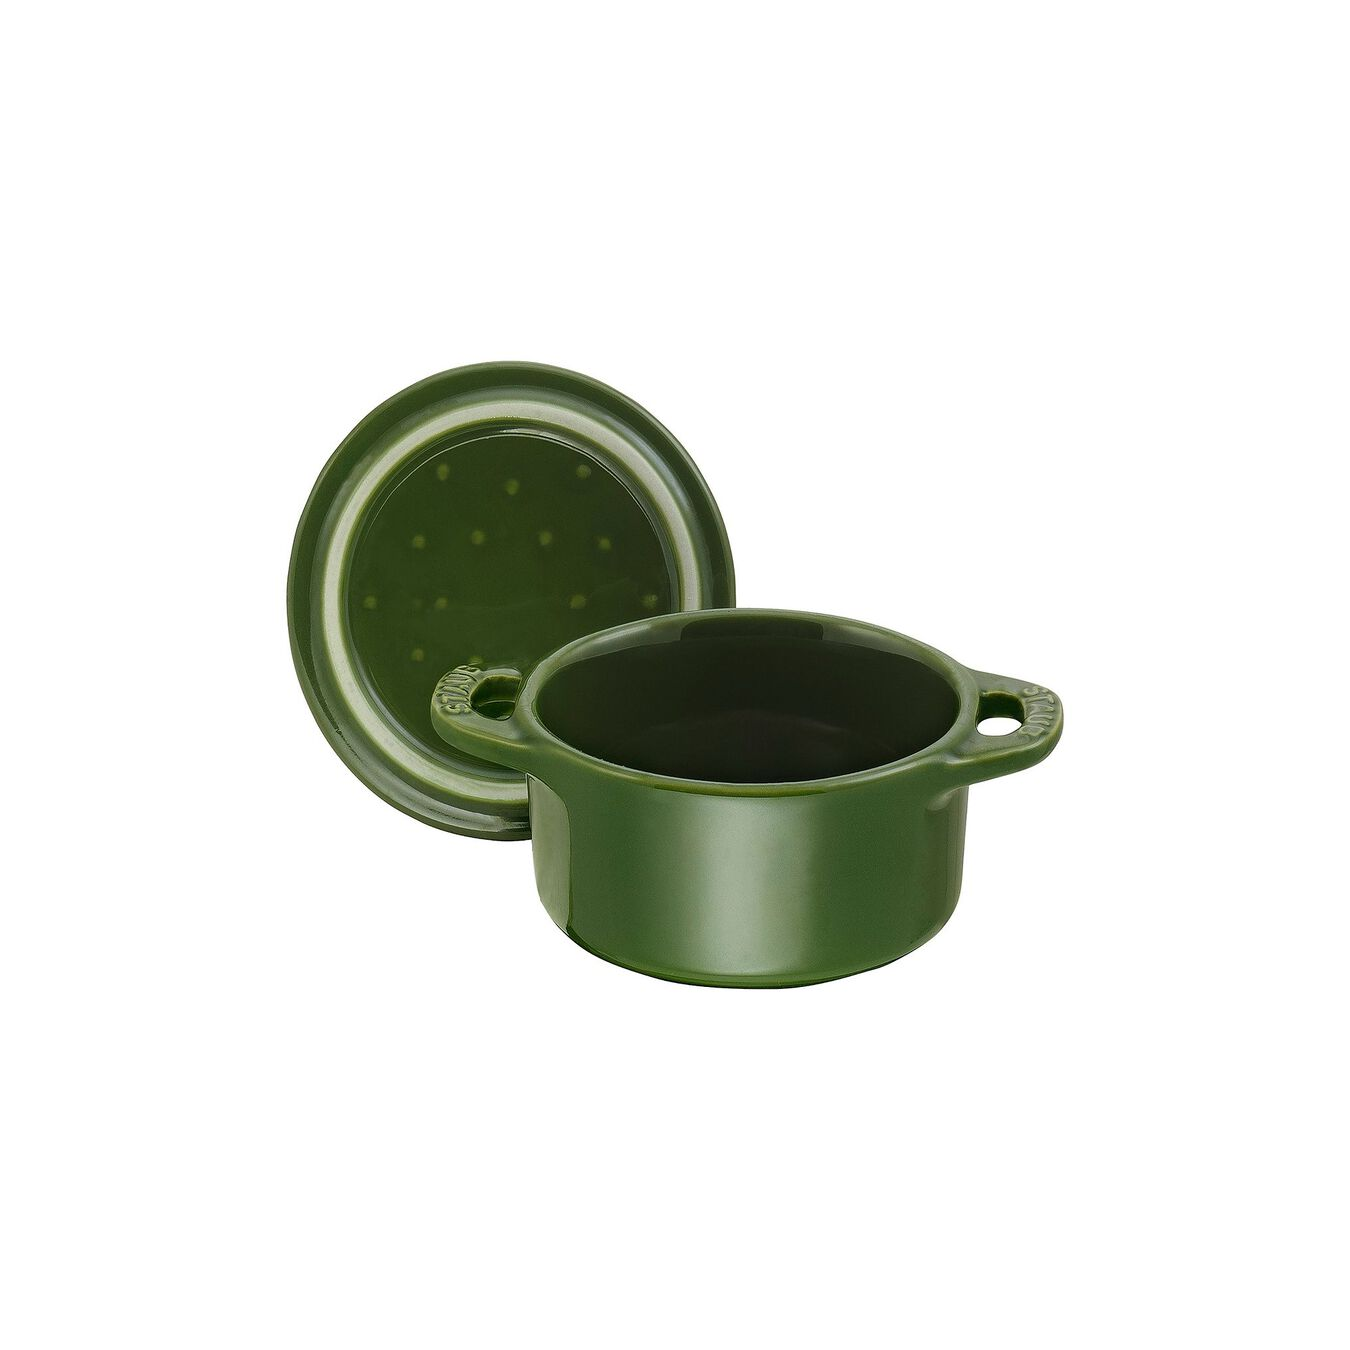 Mini Cocotte 10 cm, rund, Basilikum-Grün, Keramik,,large 2